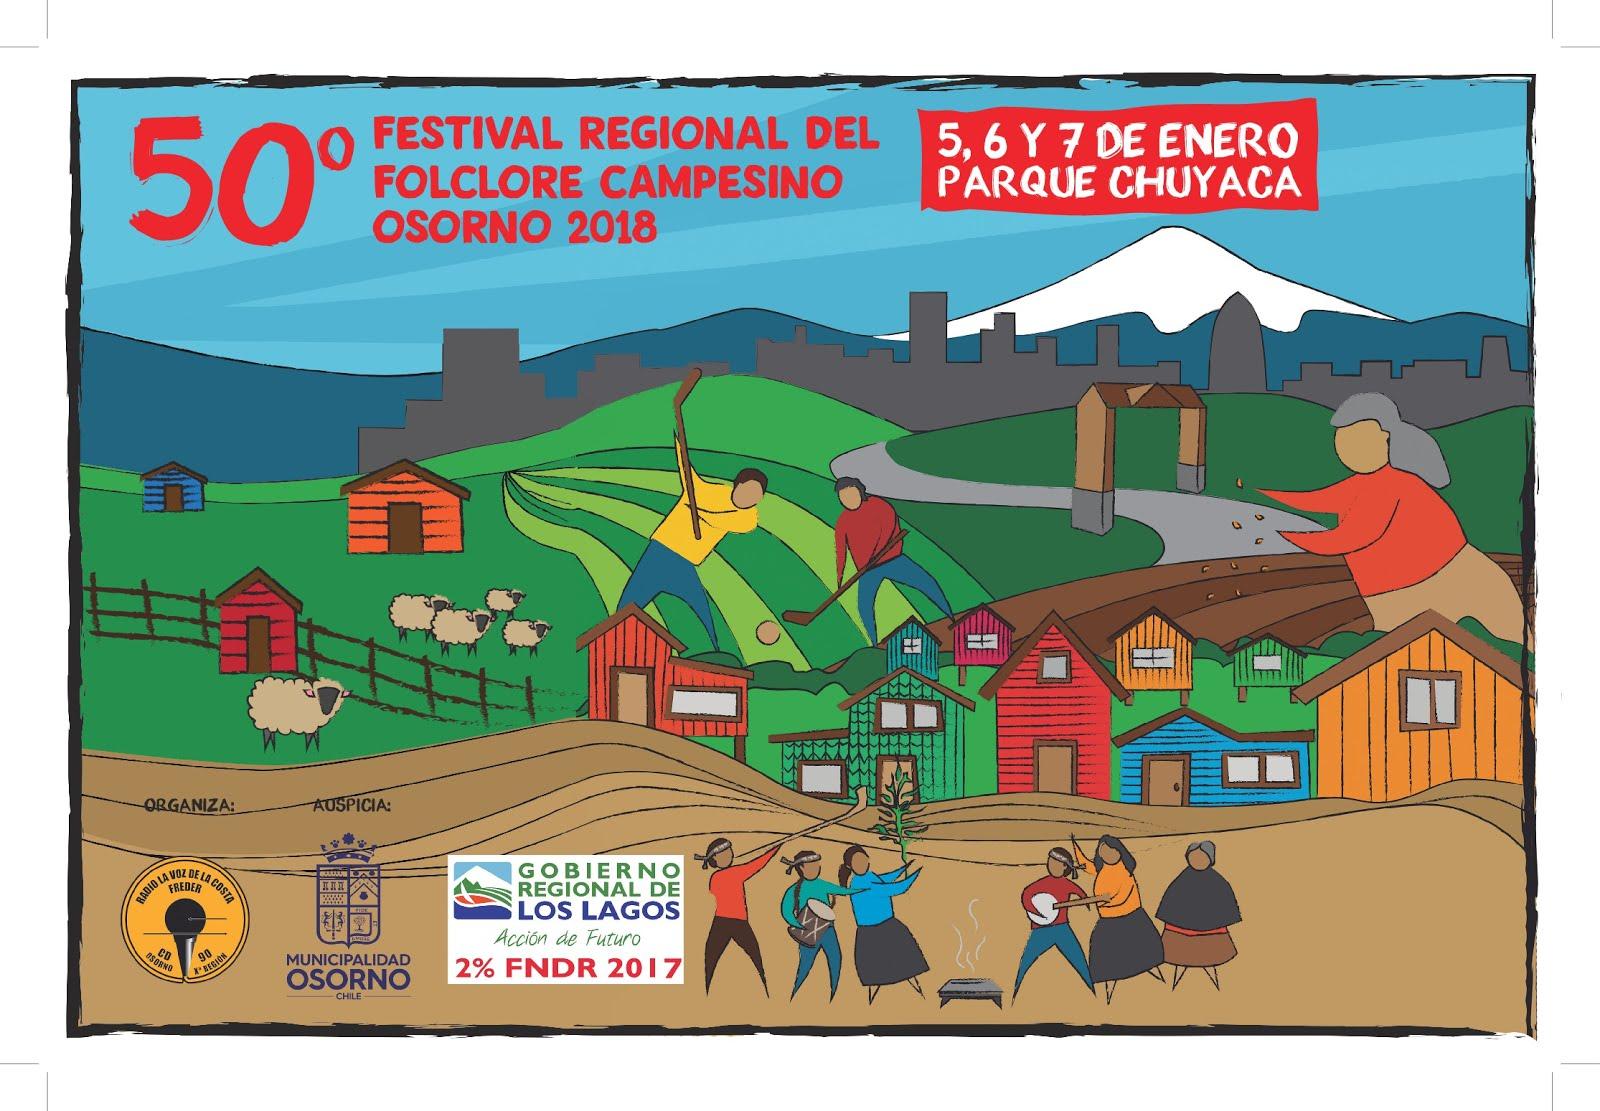 CANCIONES GANADORAS 50º FESTIVAL REGIONAL DEL FOLCLOR CAMPESINO 2018